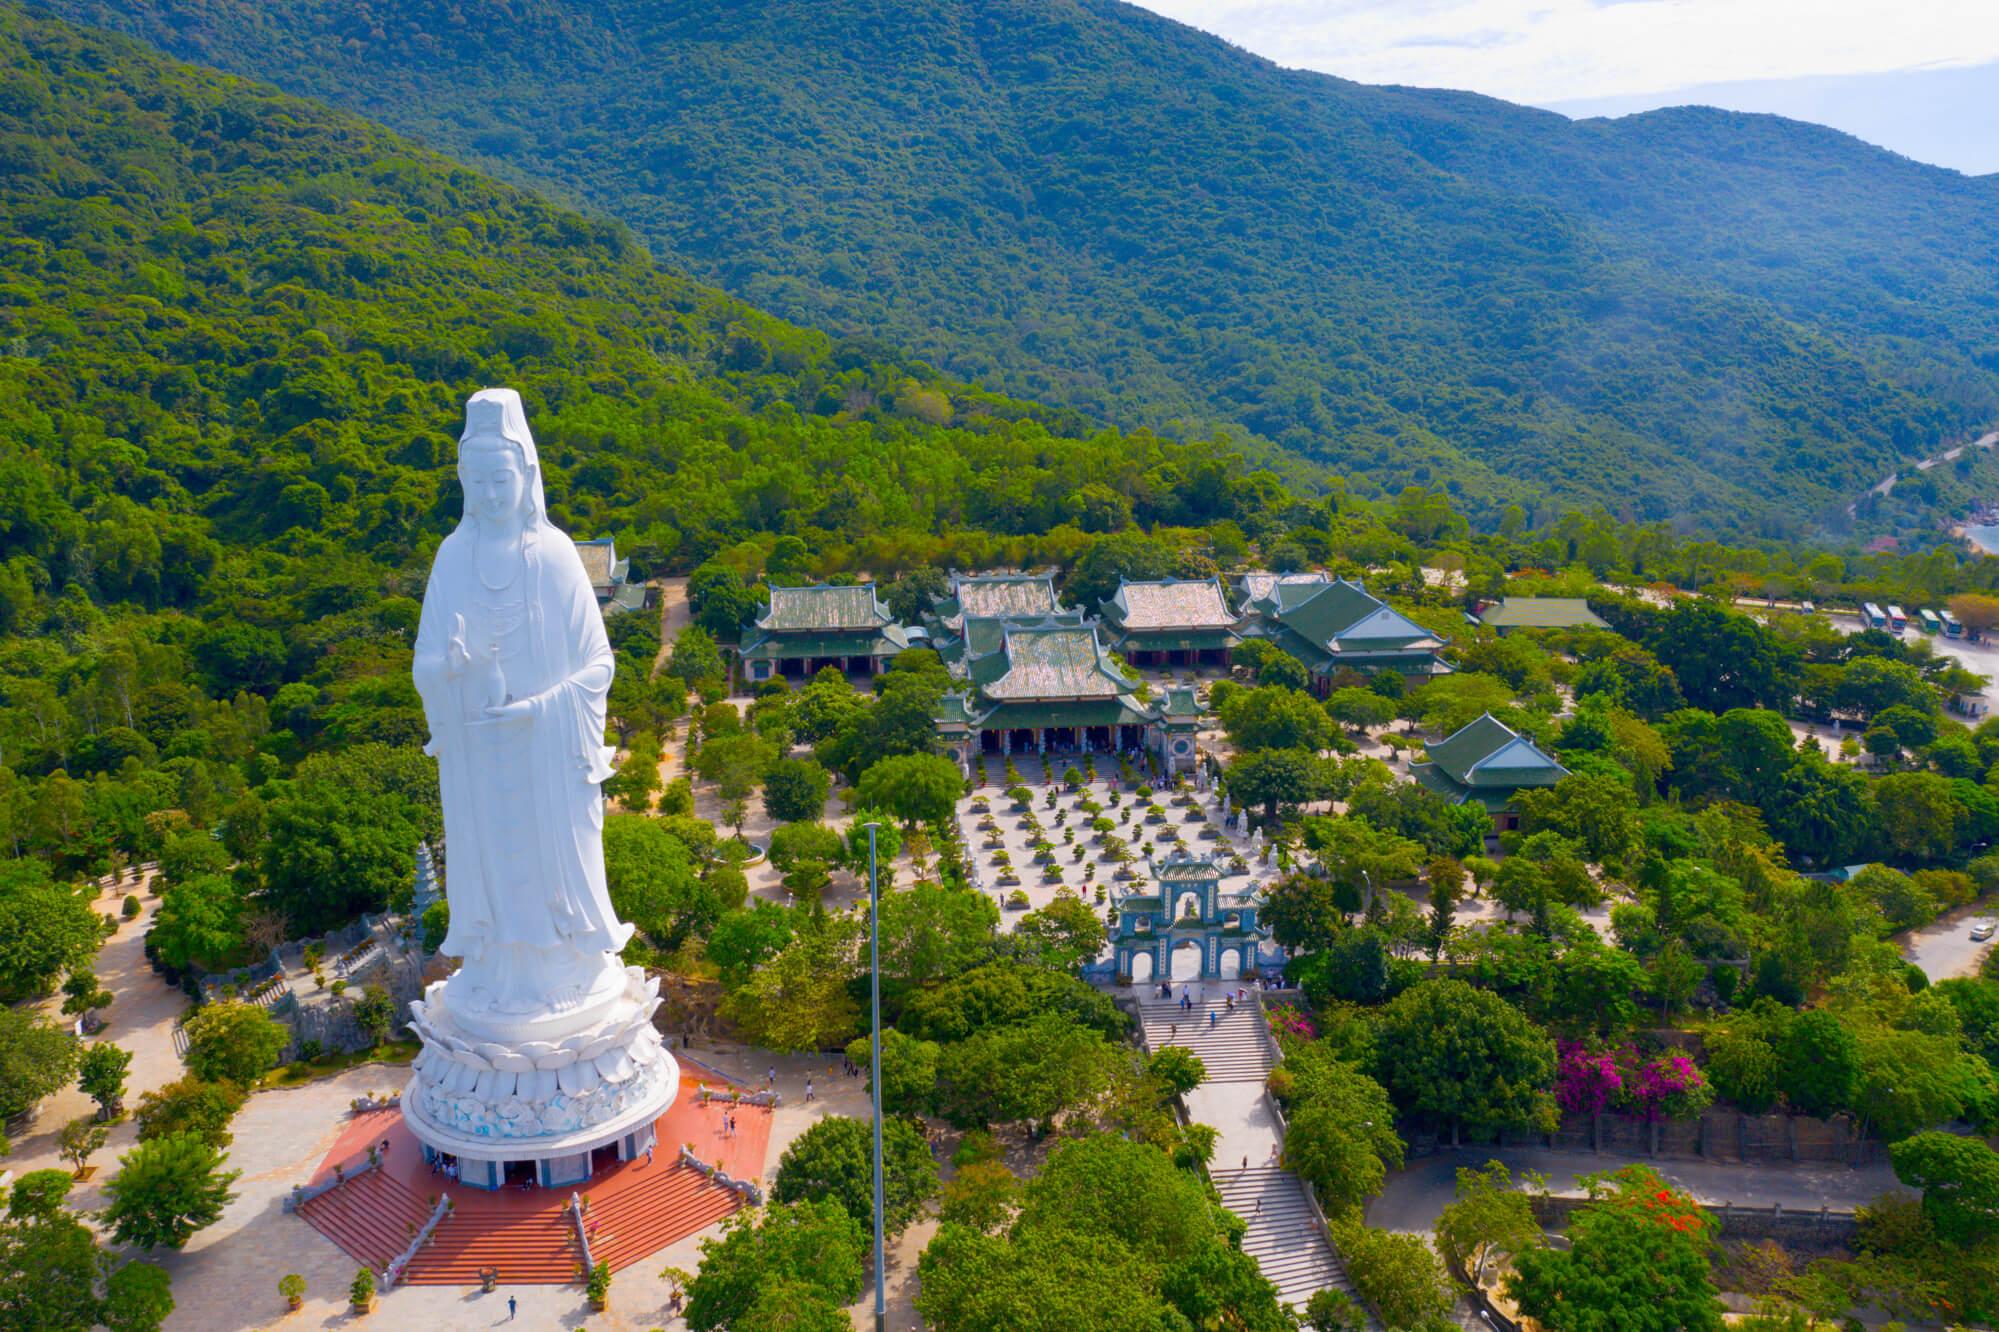 Lady Budha in Linh Ung Pagoda